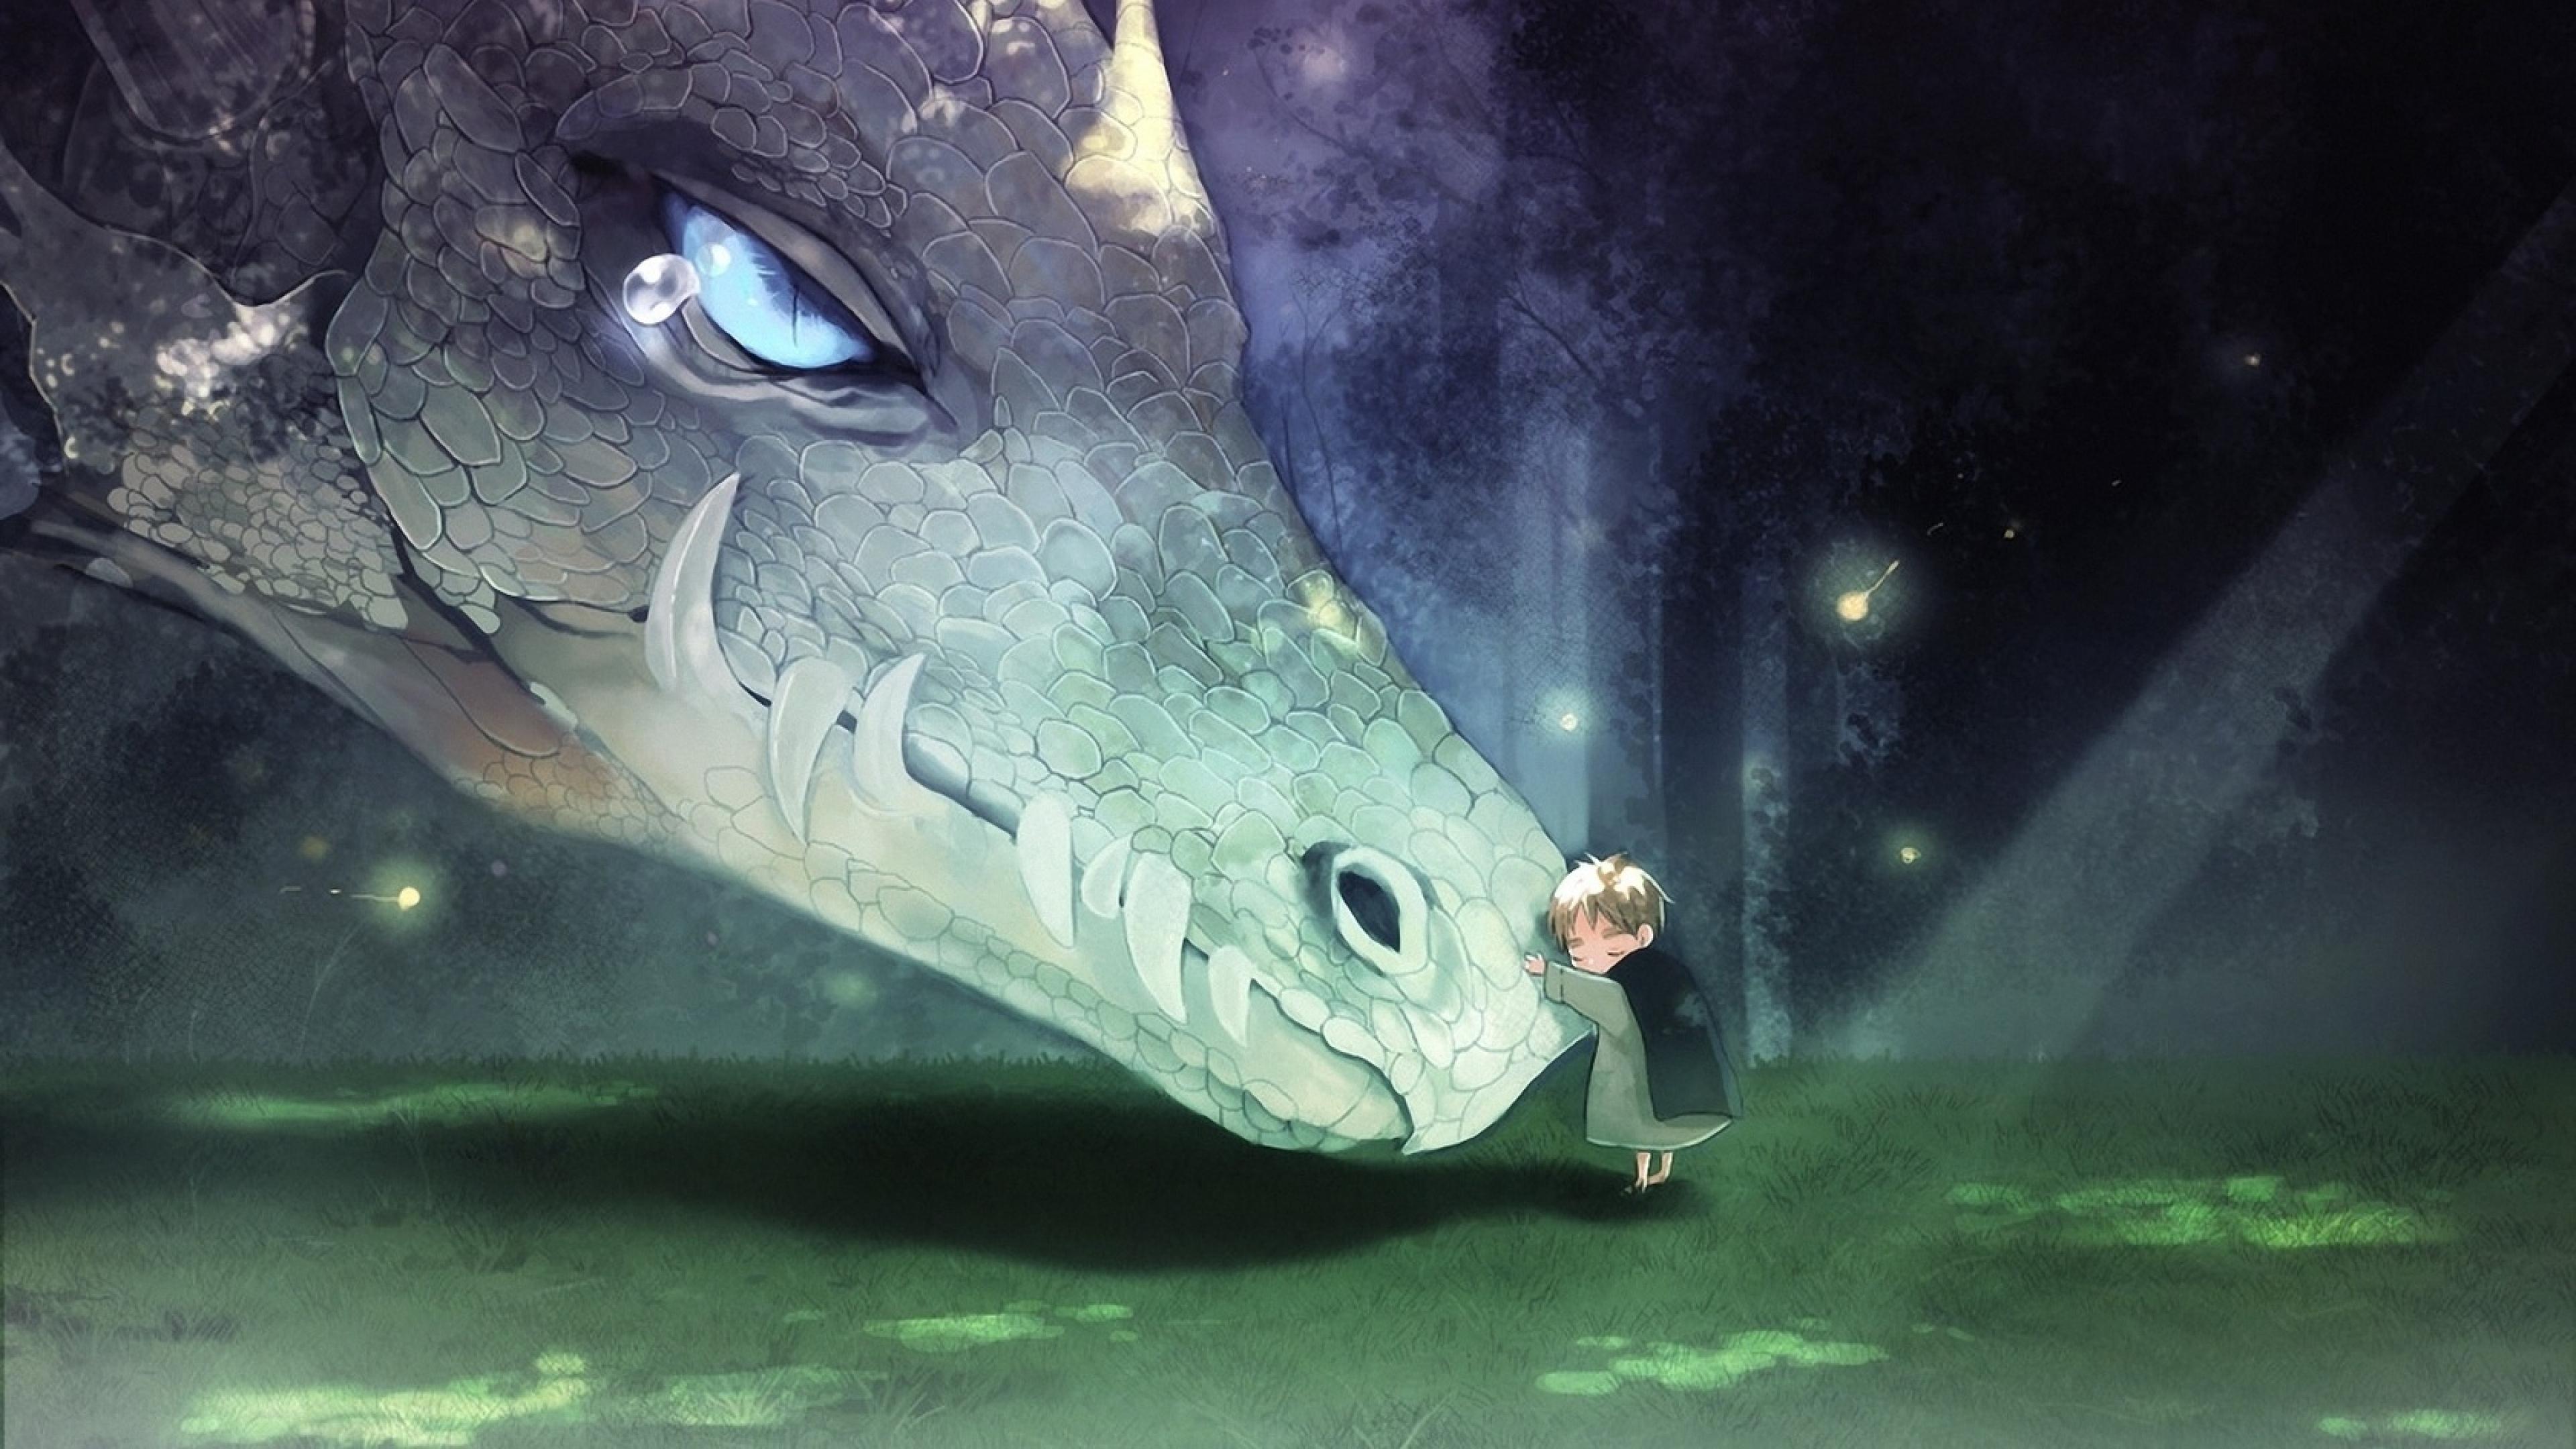 Anime Fantasy Dragon Baby Friends Wallpaper Background 4K Ultra 3840x2160